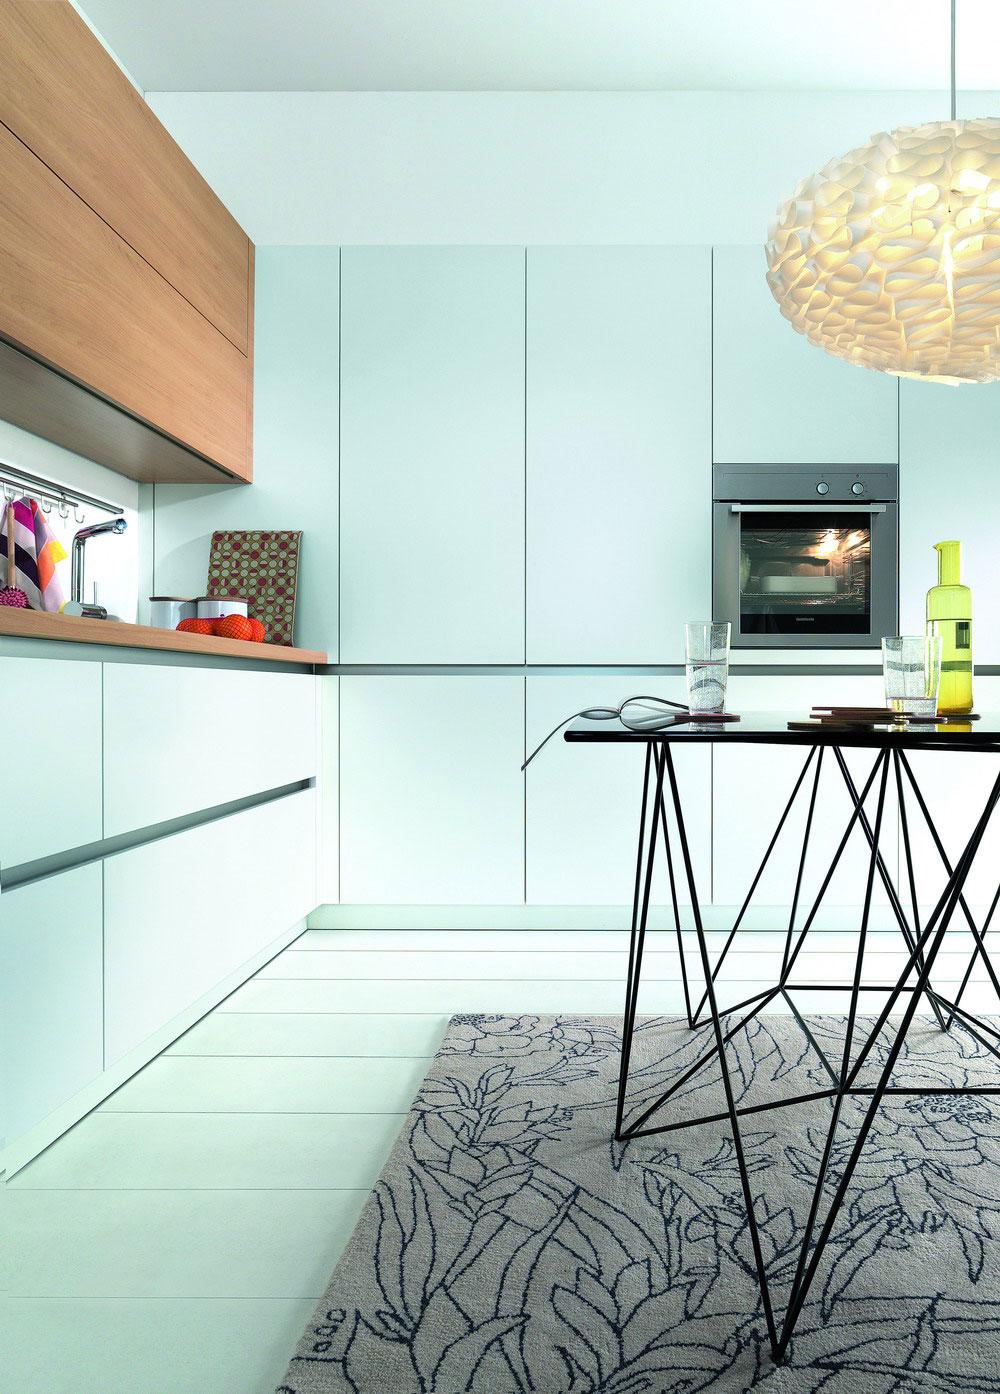 cuisine sans poignees 14 photo de cuisine moderne design. Black Bedroom Furniture Sets. Home Design Ideas